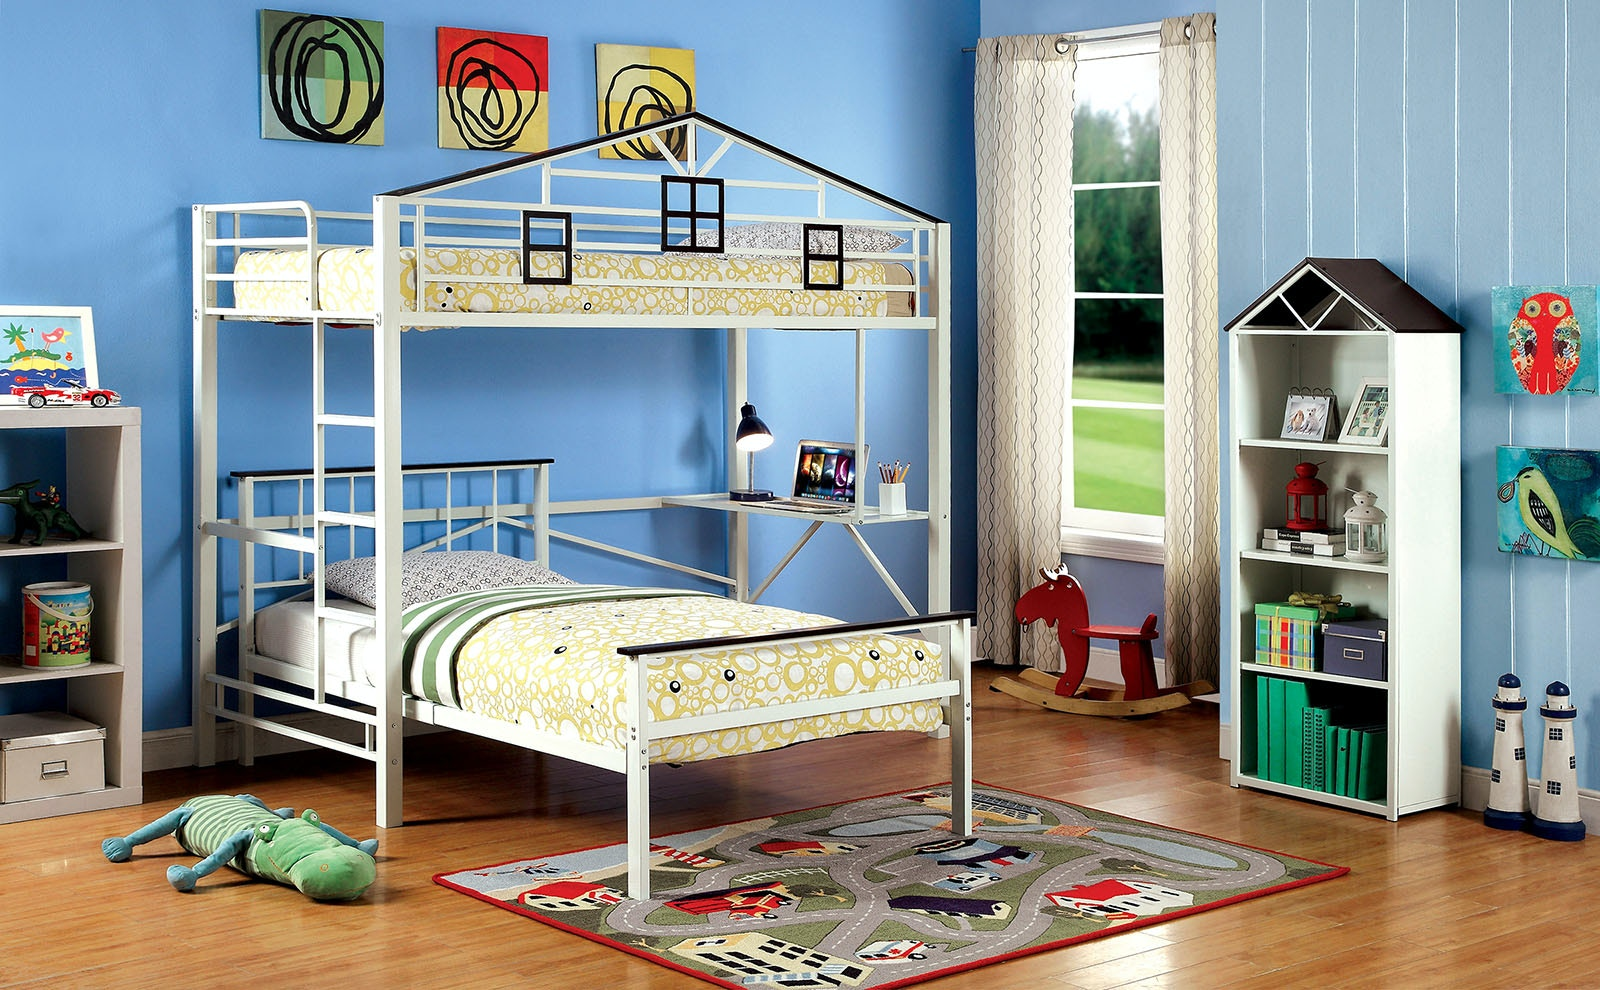 Furniture Of America Bedroom Loft Bed Cm Bk933l The Furniture Mall